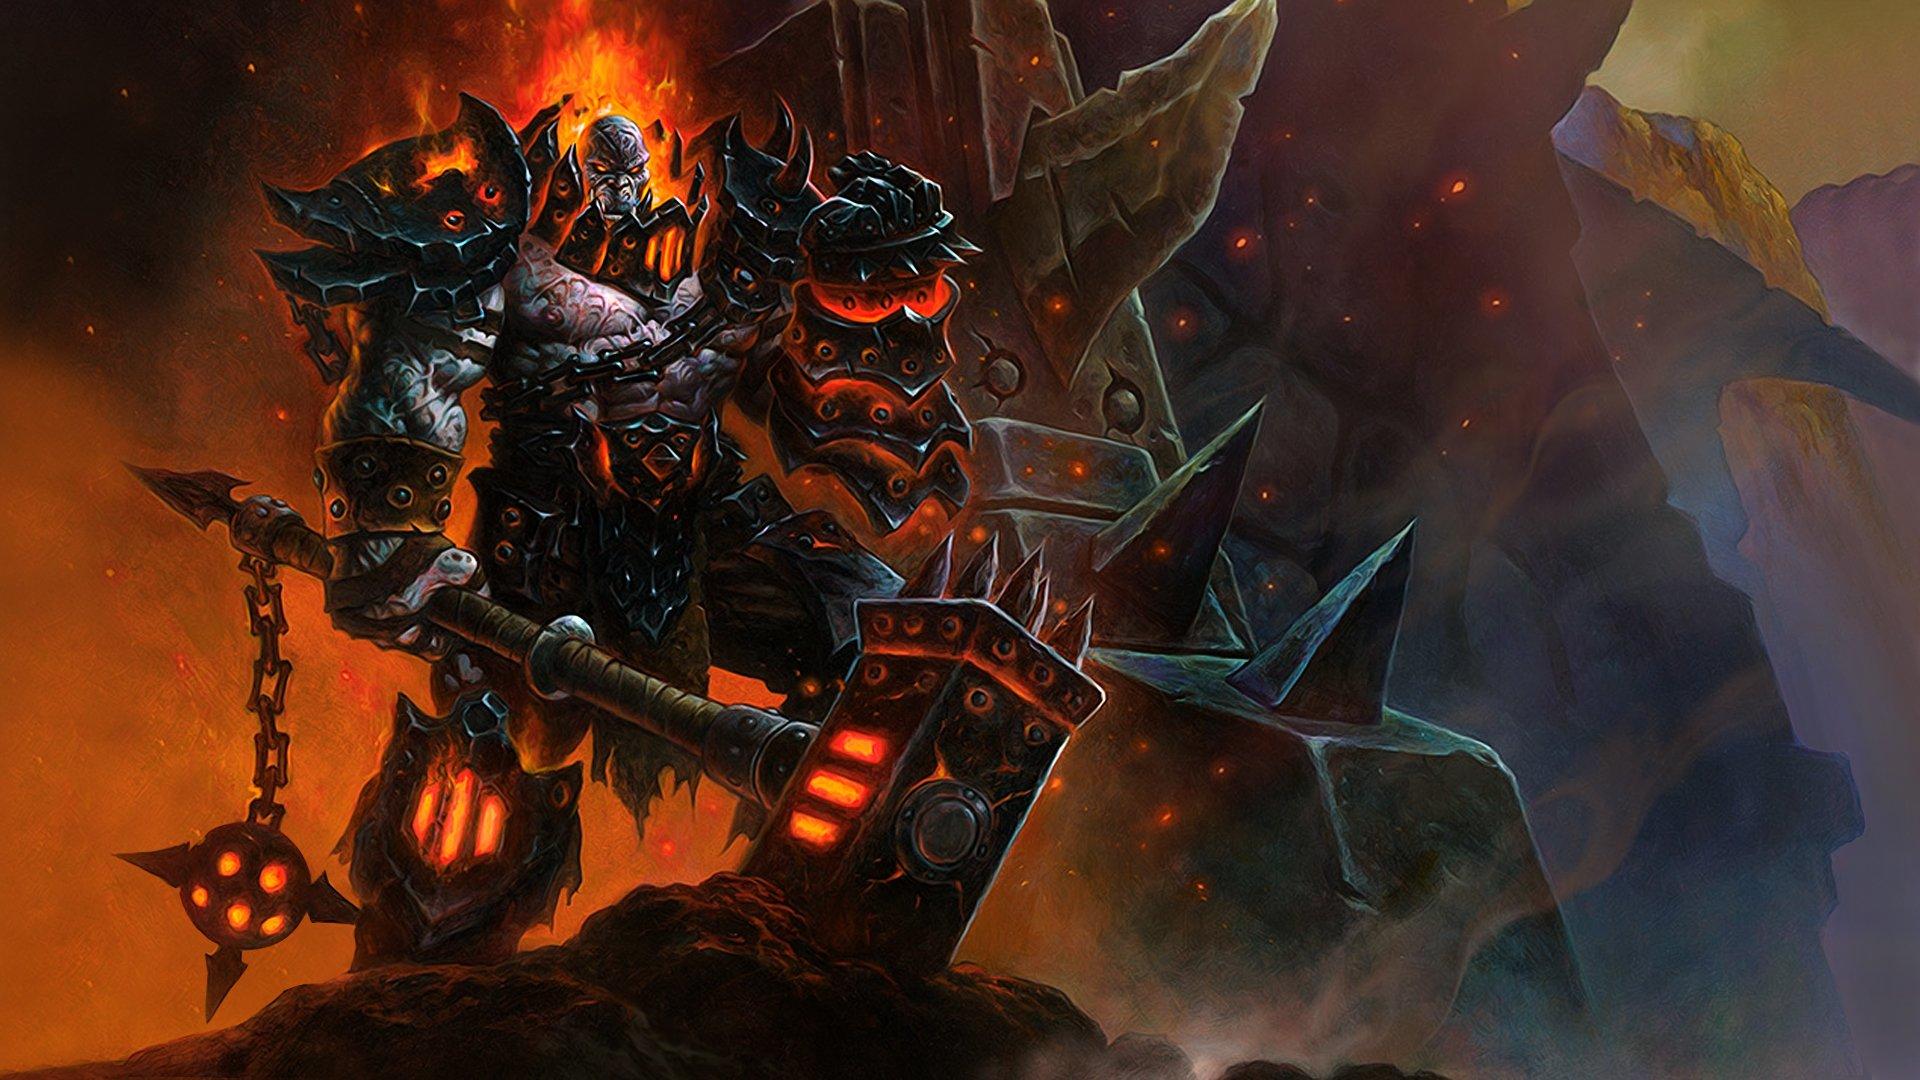 Fall Of The Lich King Wallpaper World Of Warcraft Wallpapers Hd Pixelstalk Net